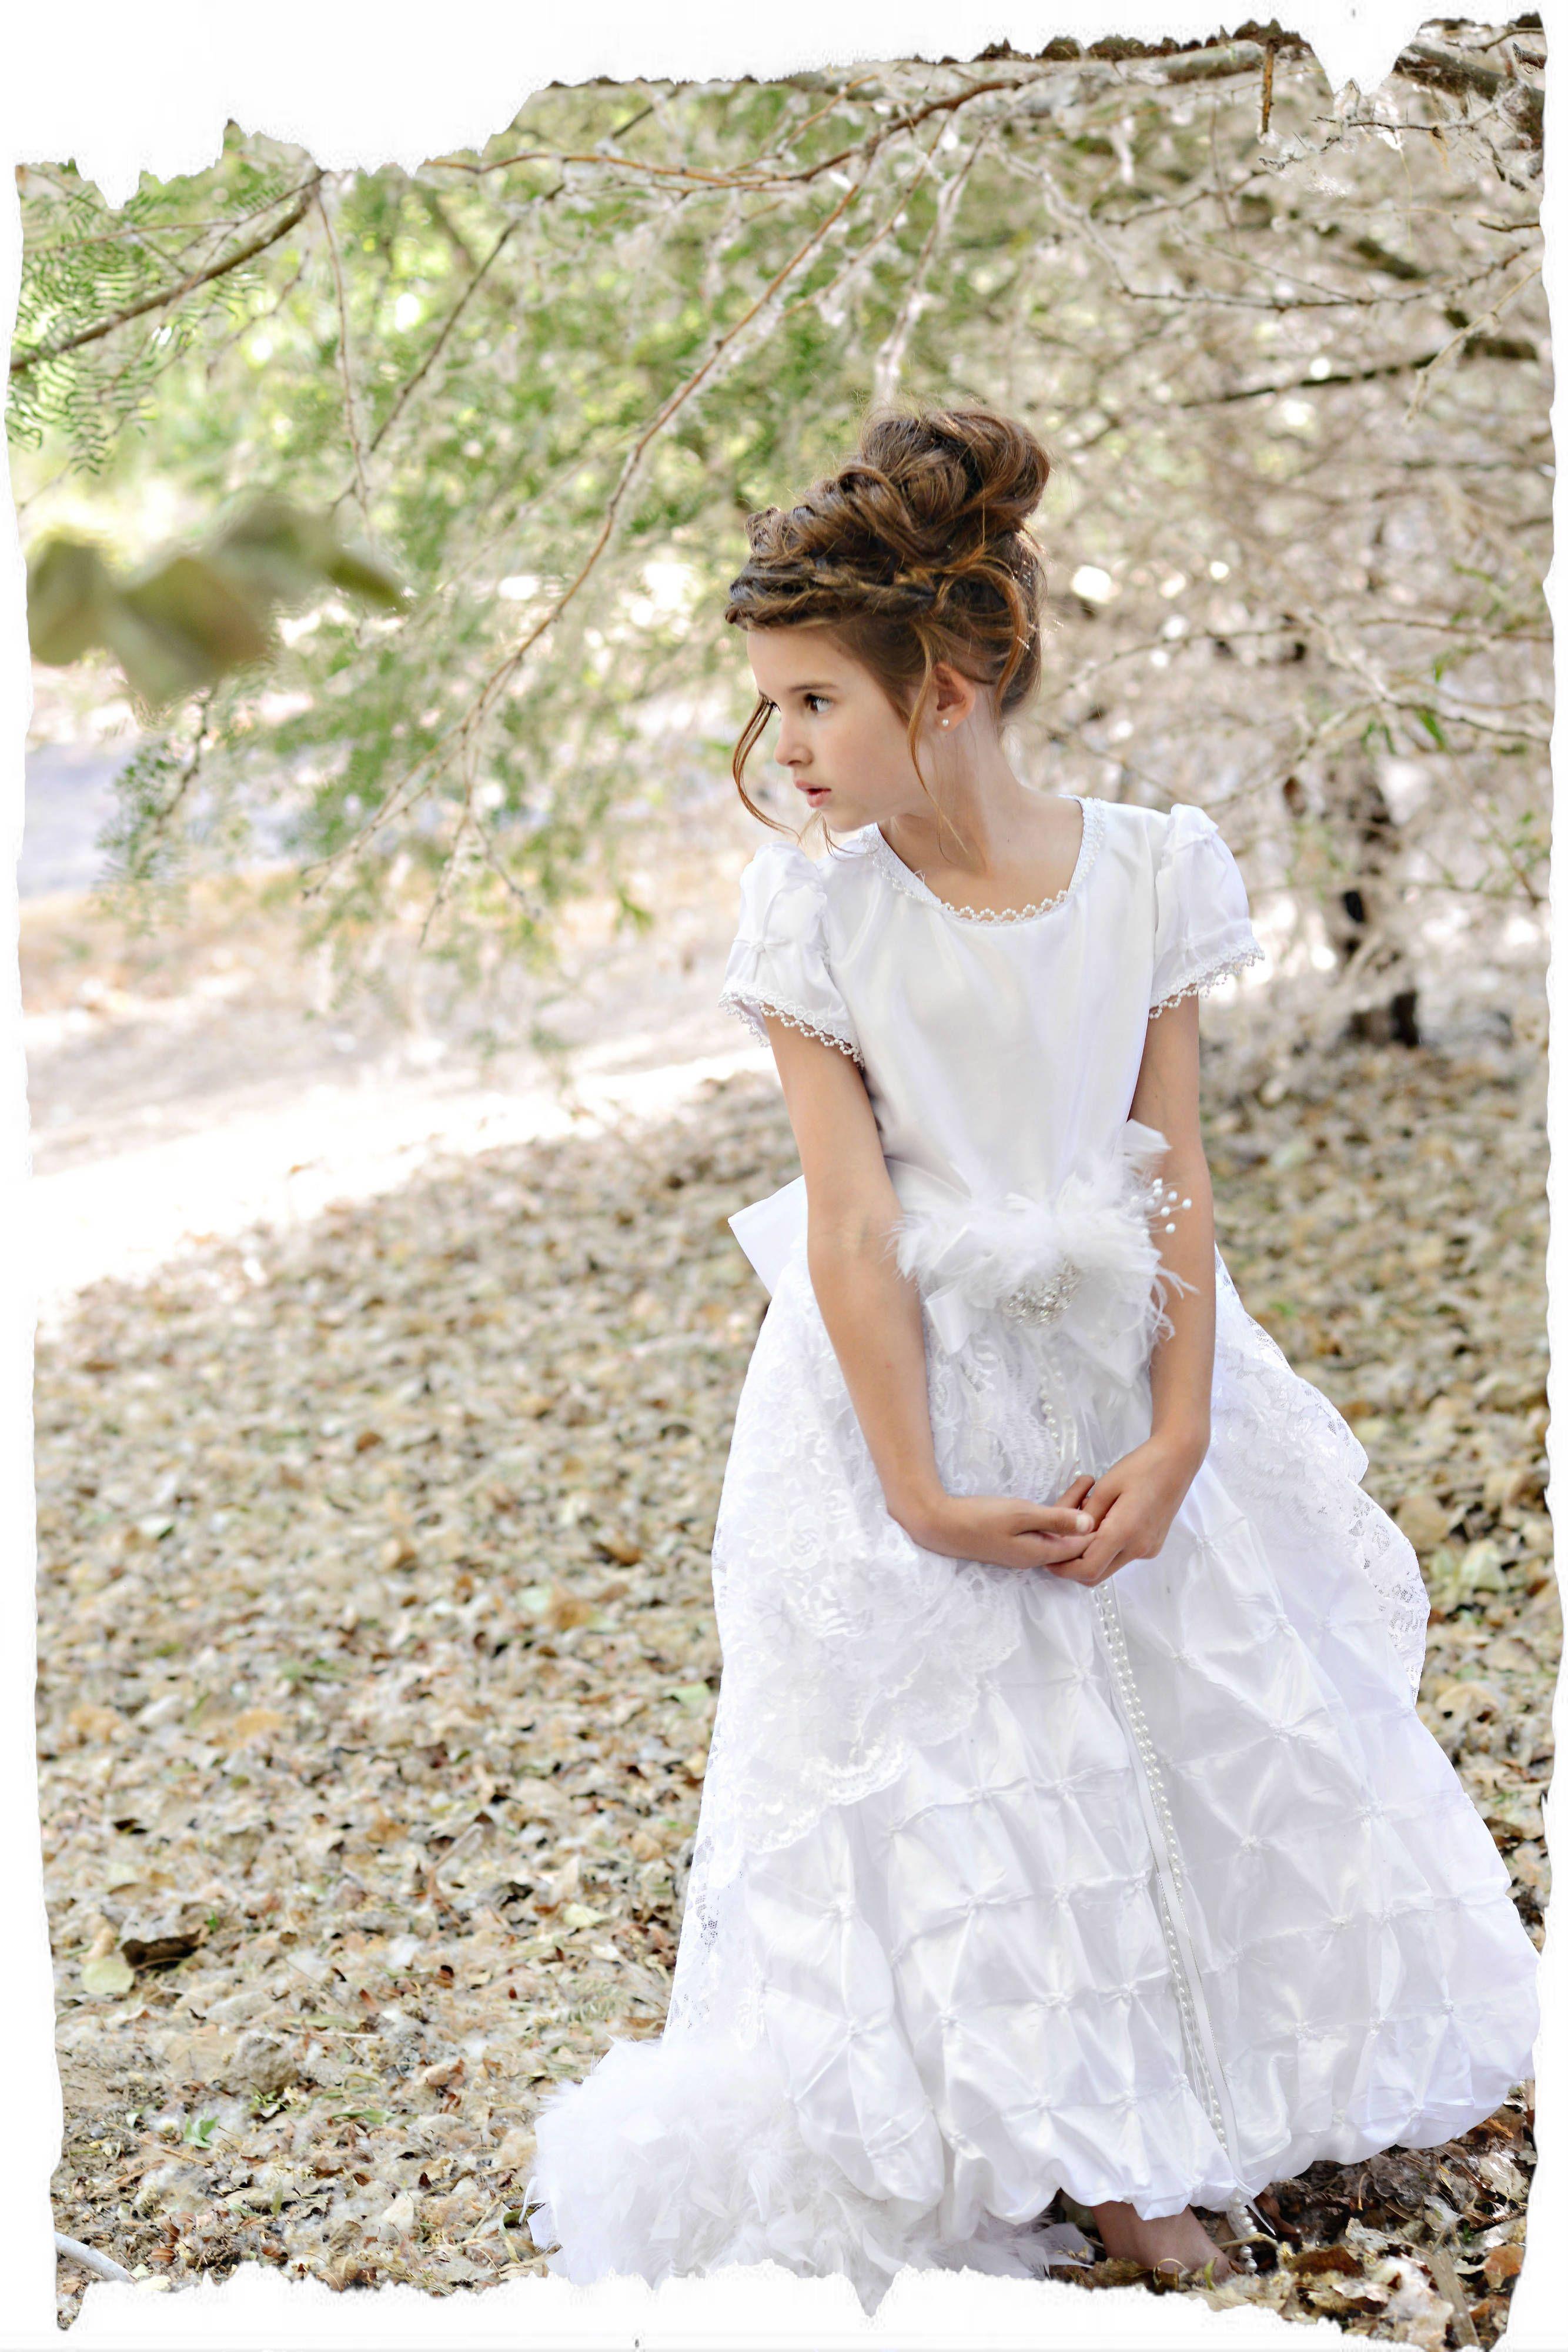 Sweetness and sunshine dress by babycoco bellea childrenus fashion